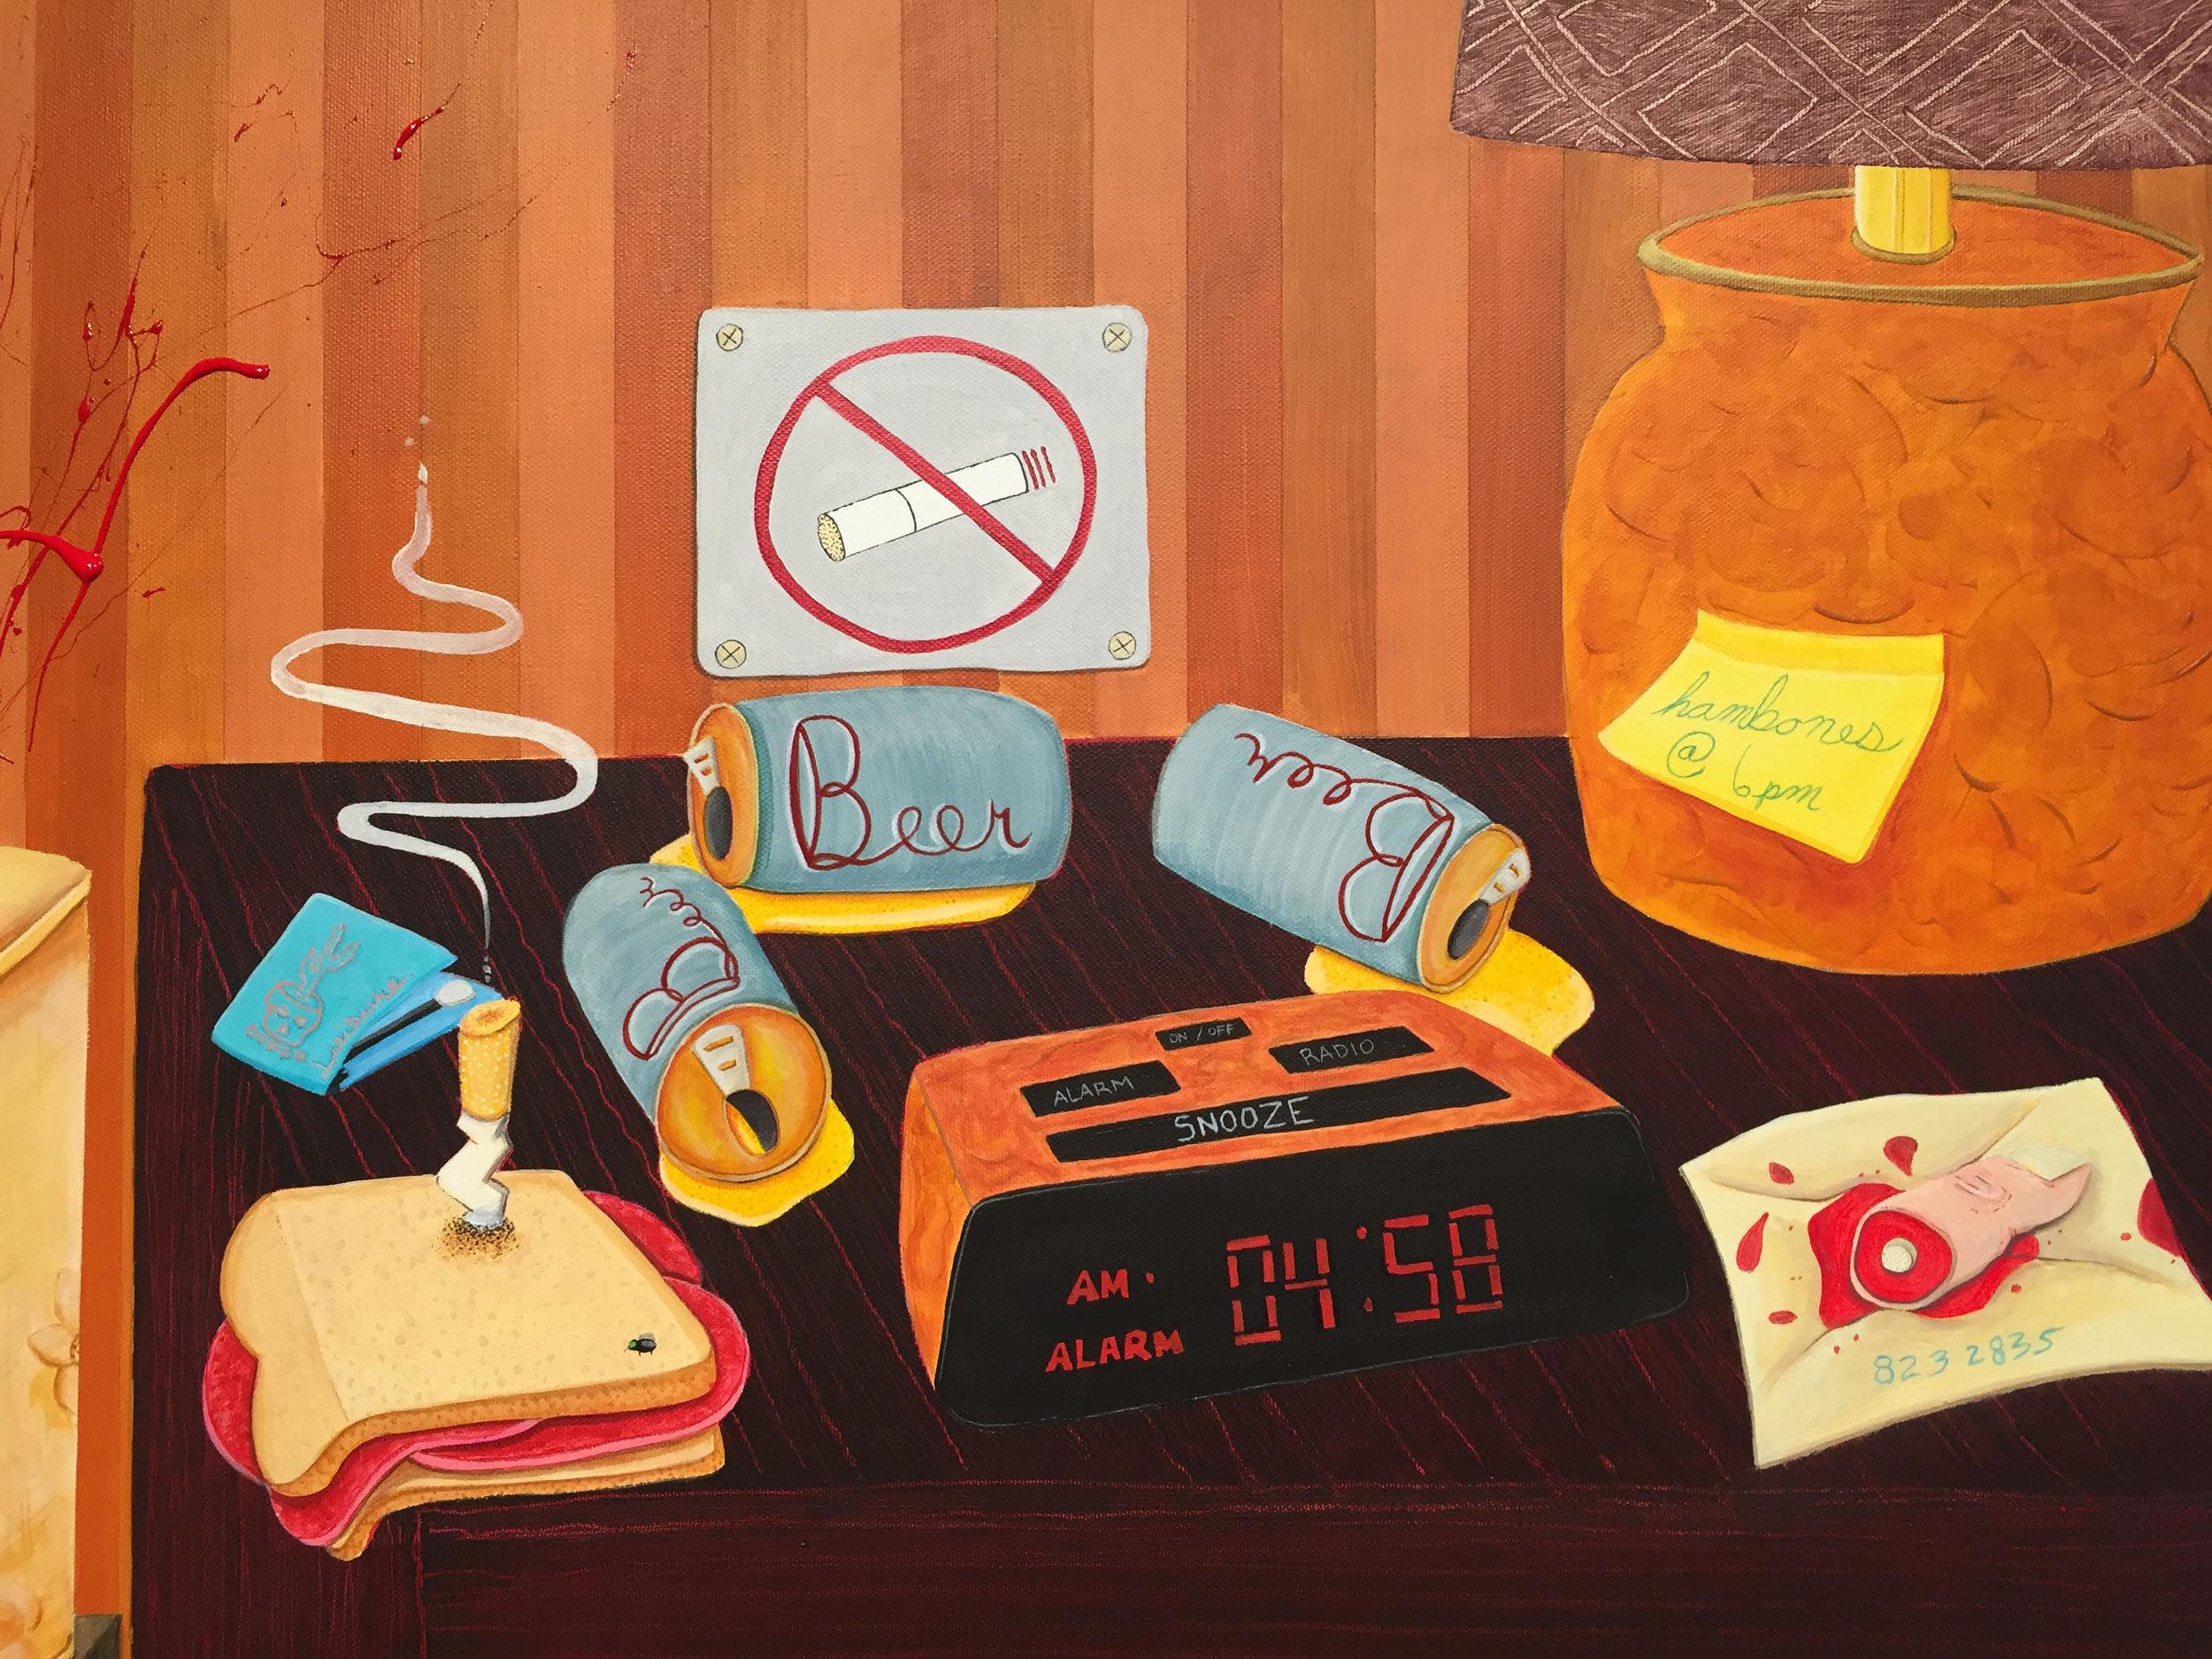 5a.m. wake up call